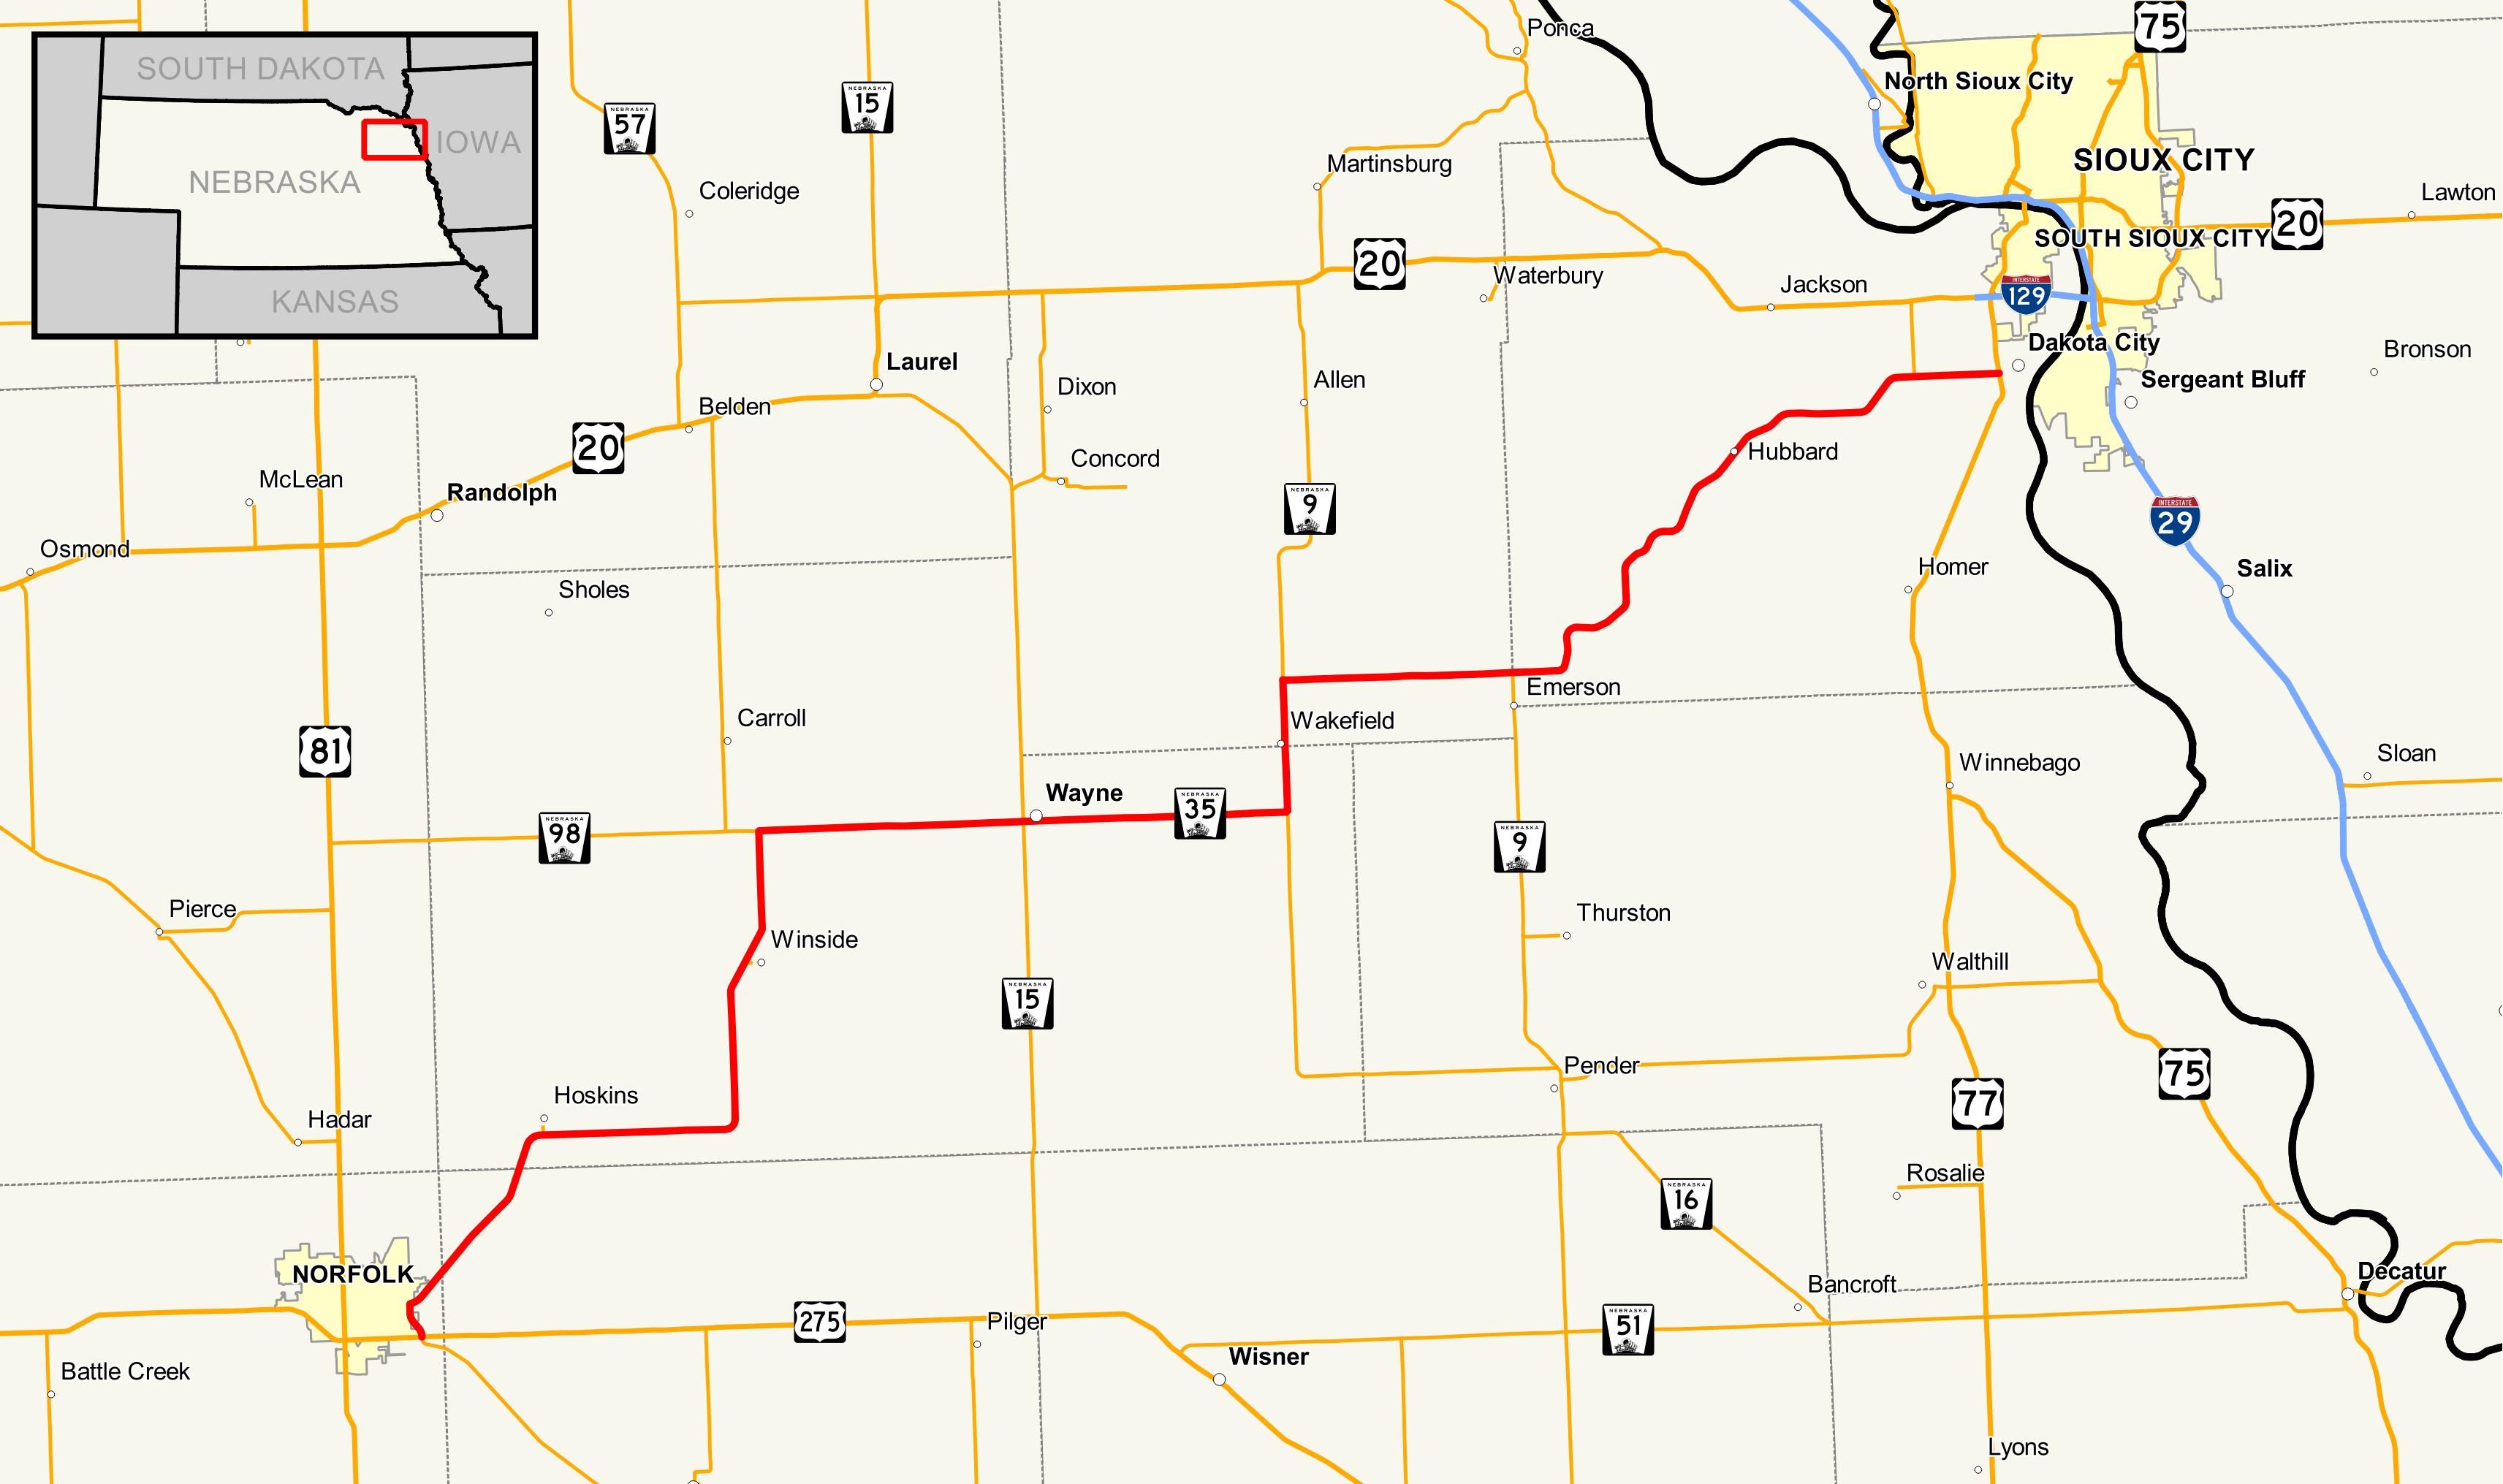 nebraska highway 35 - wikipedia